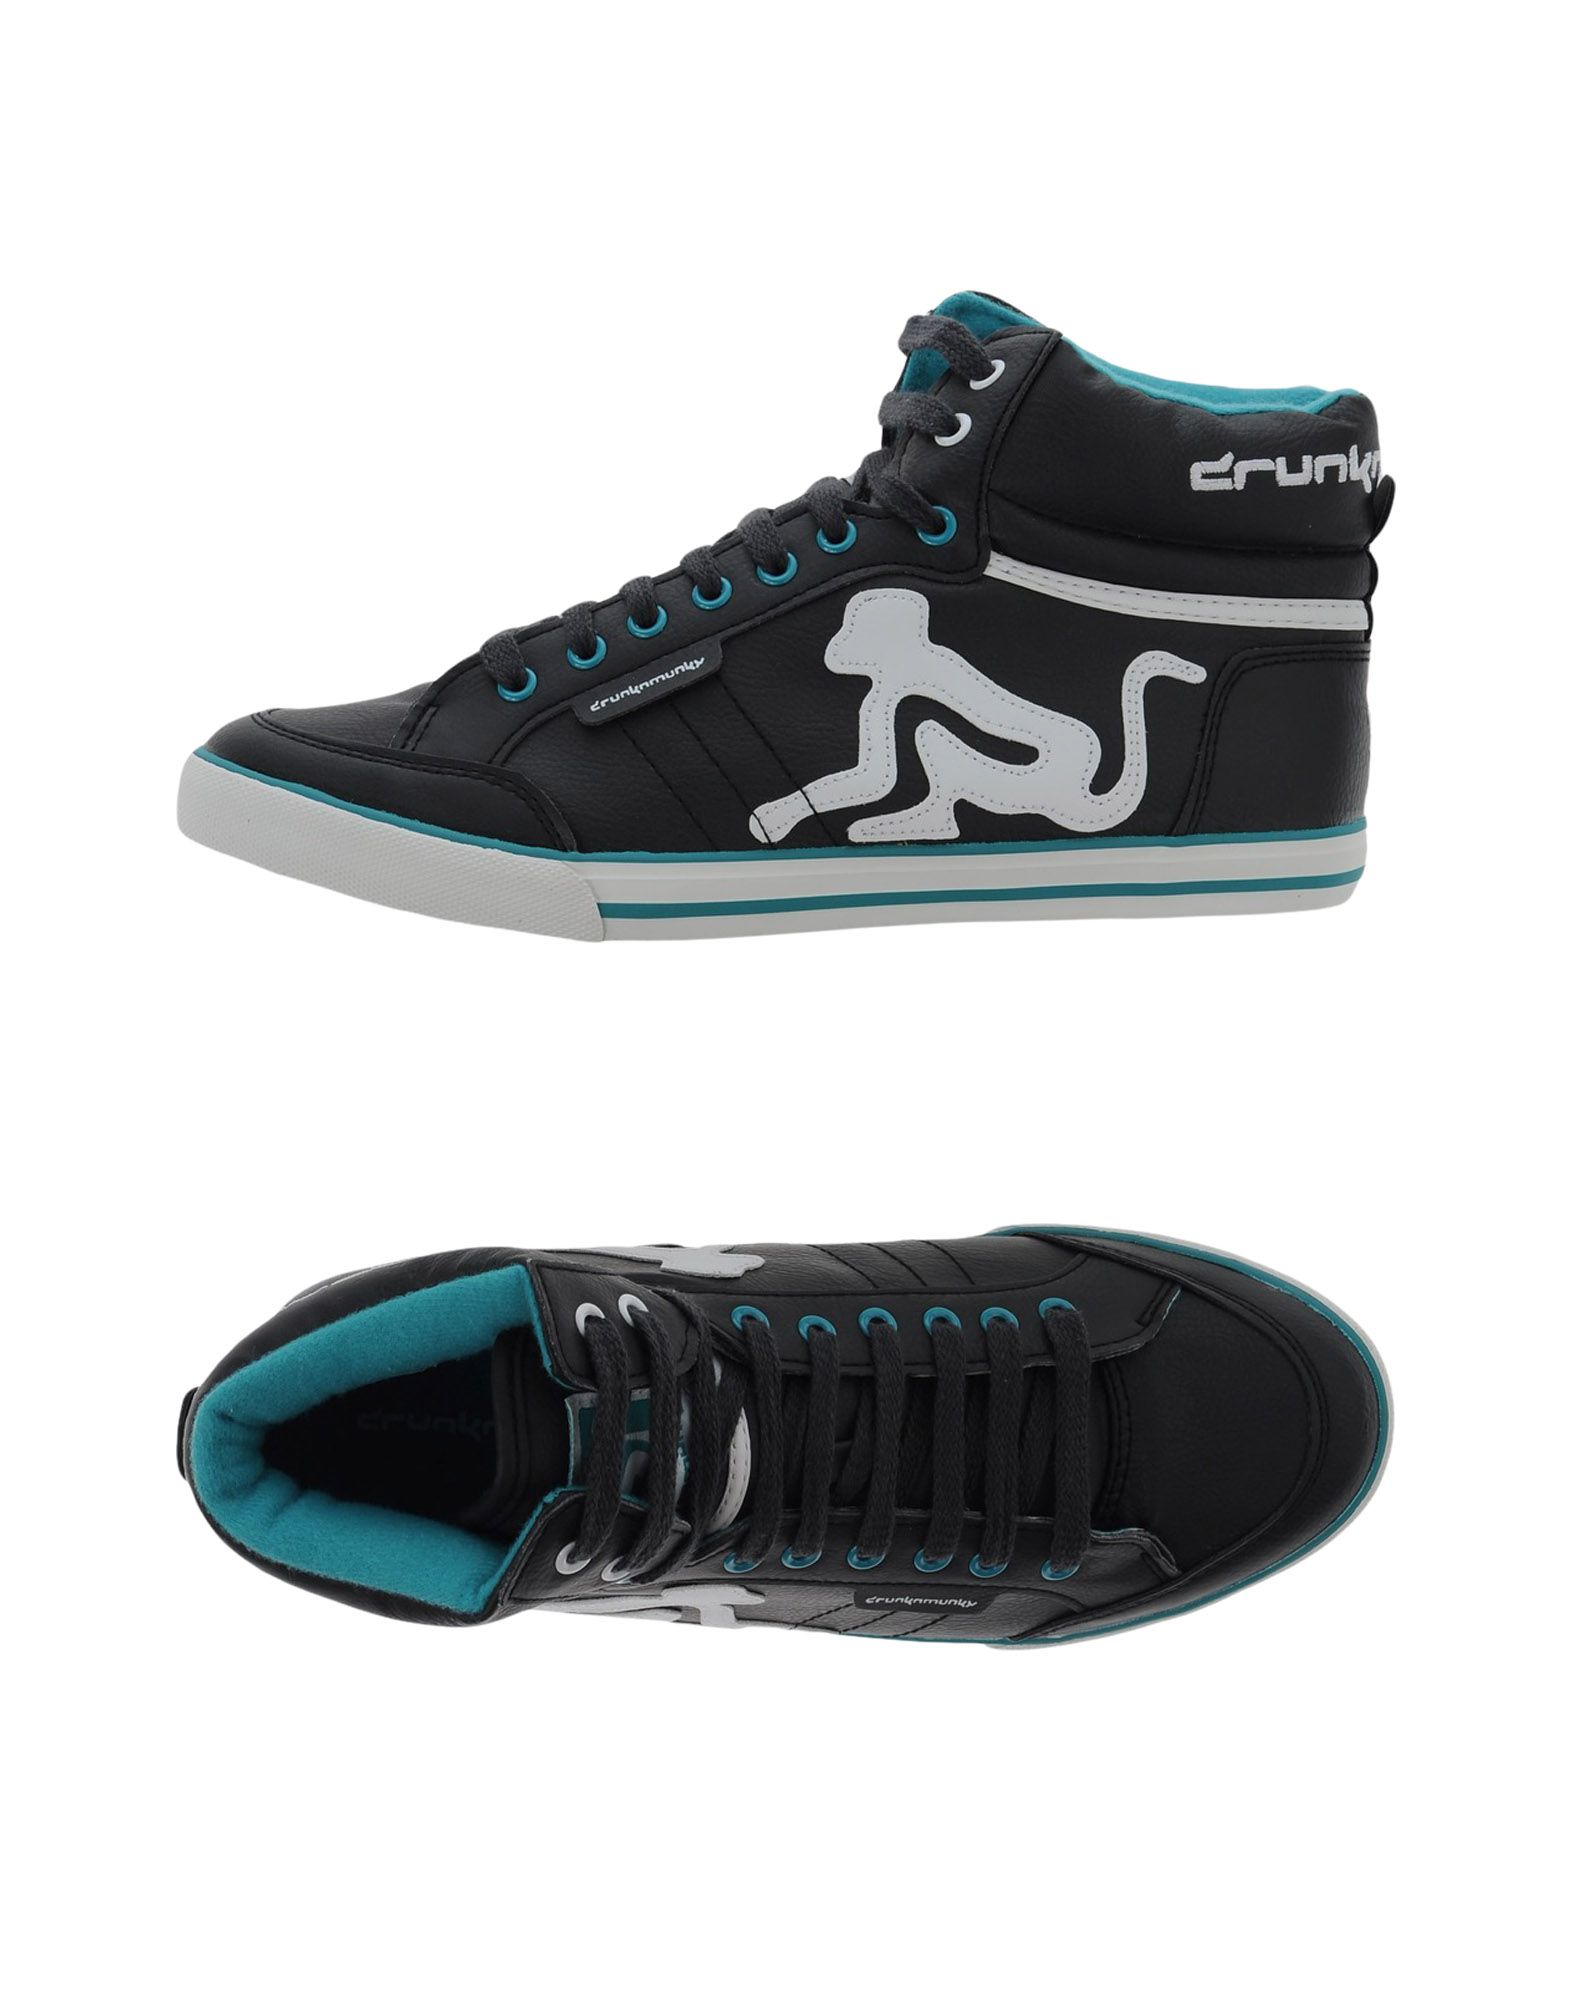 A buon mercato Sneakers Drunknmunky Uomo - 11344988MX